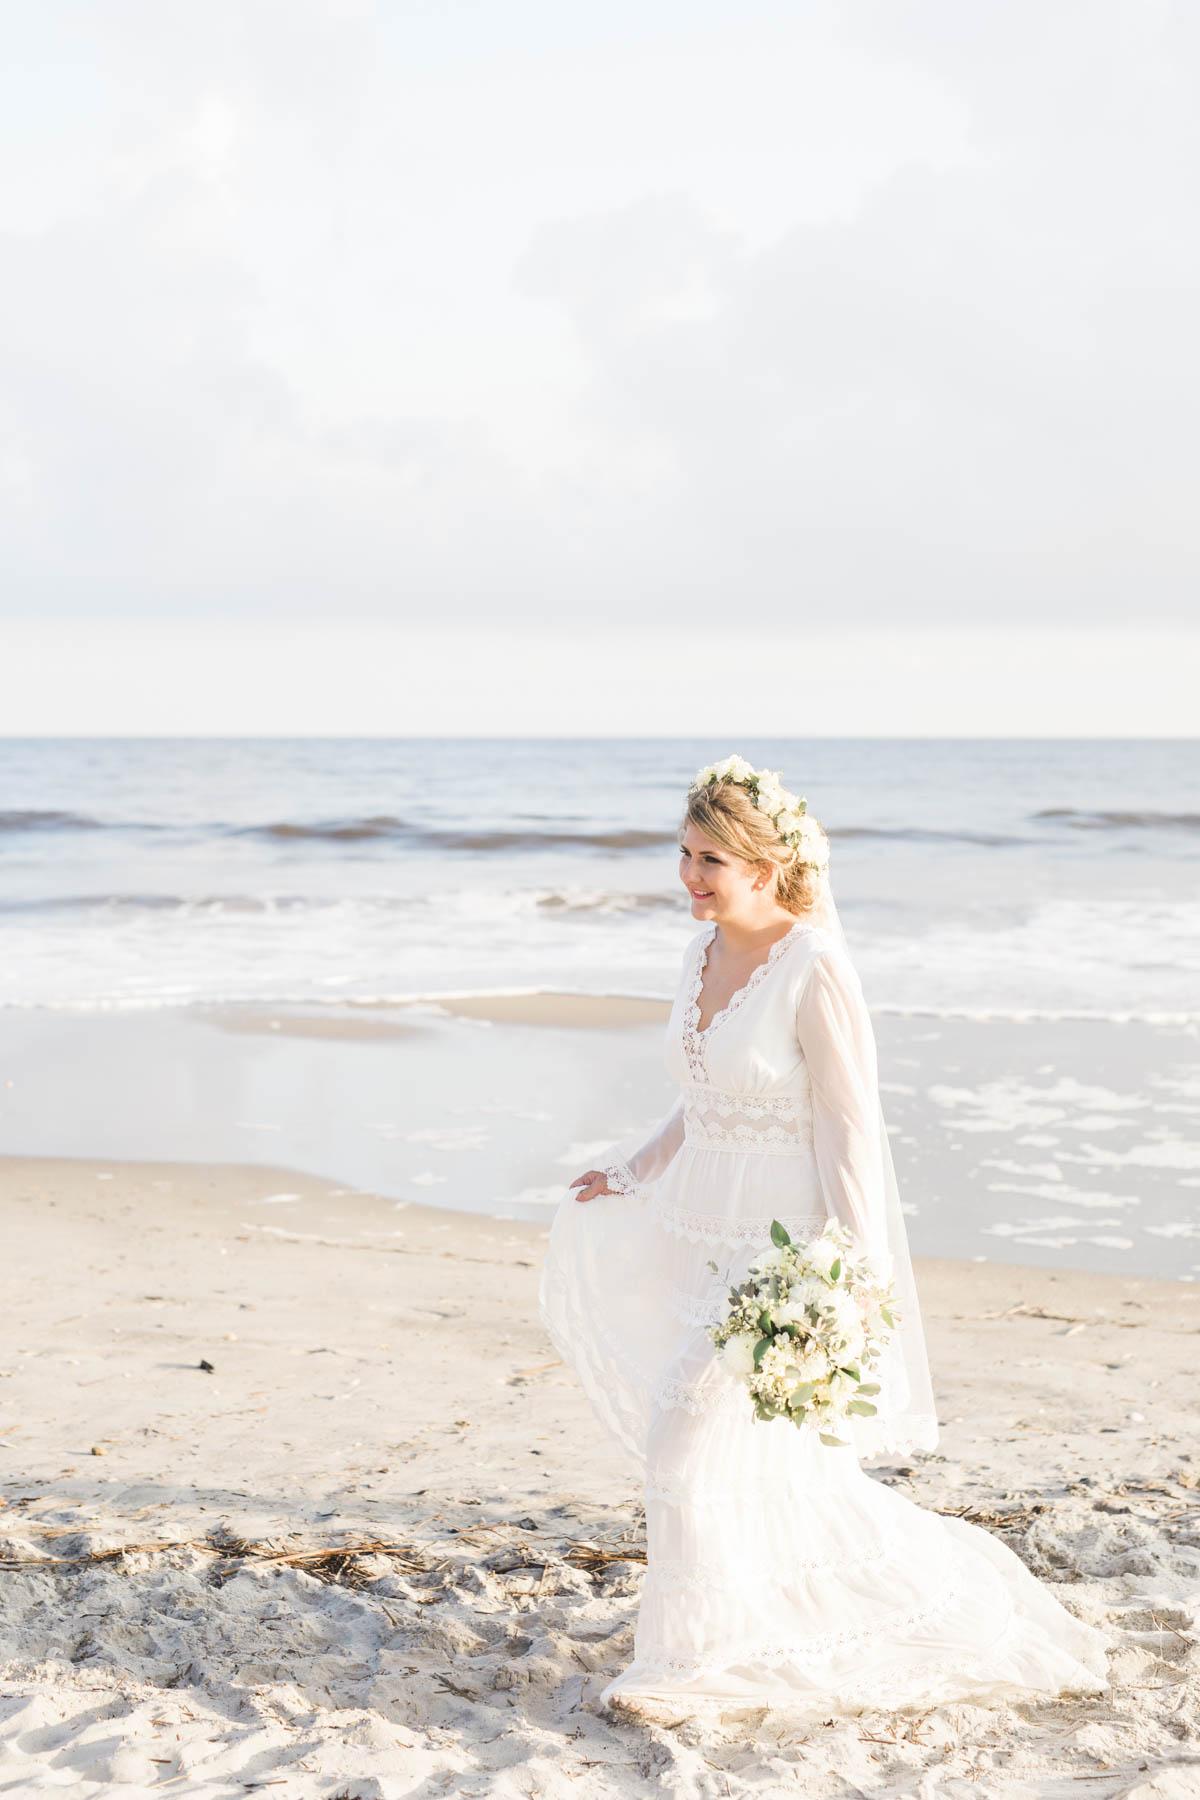 shotbychelsea_wedding_blog-46.jpg